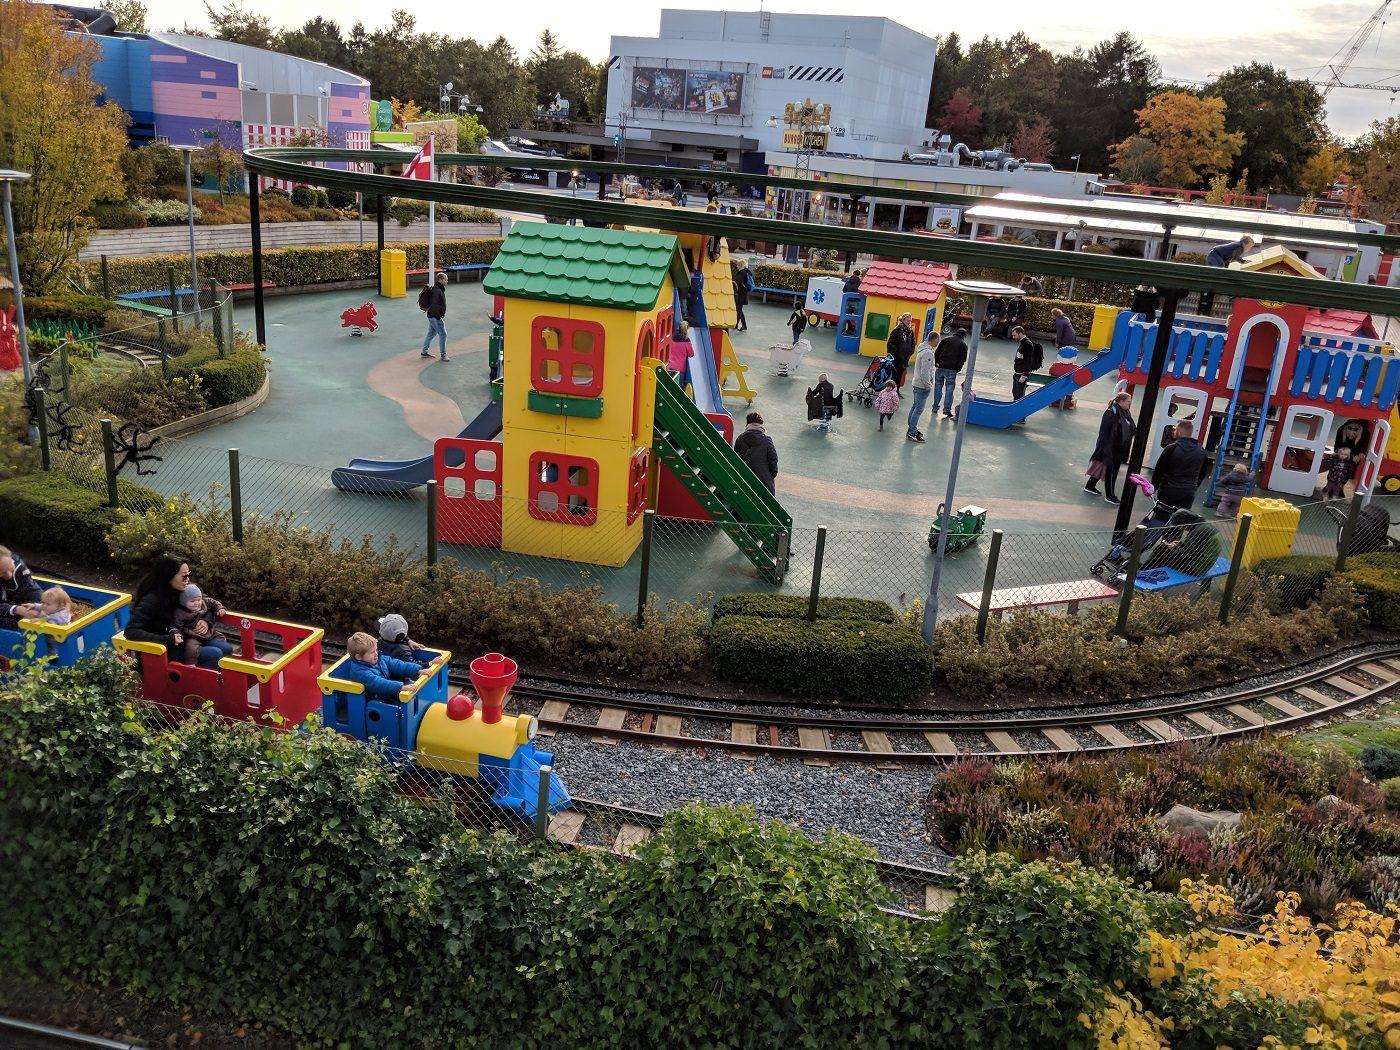 Legoland Billund Park